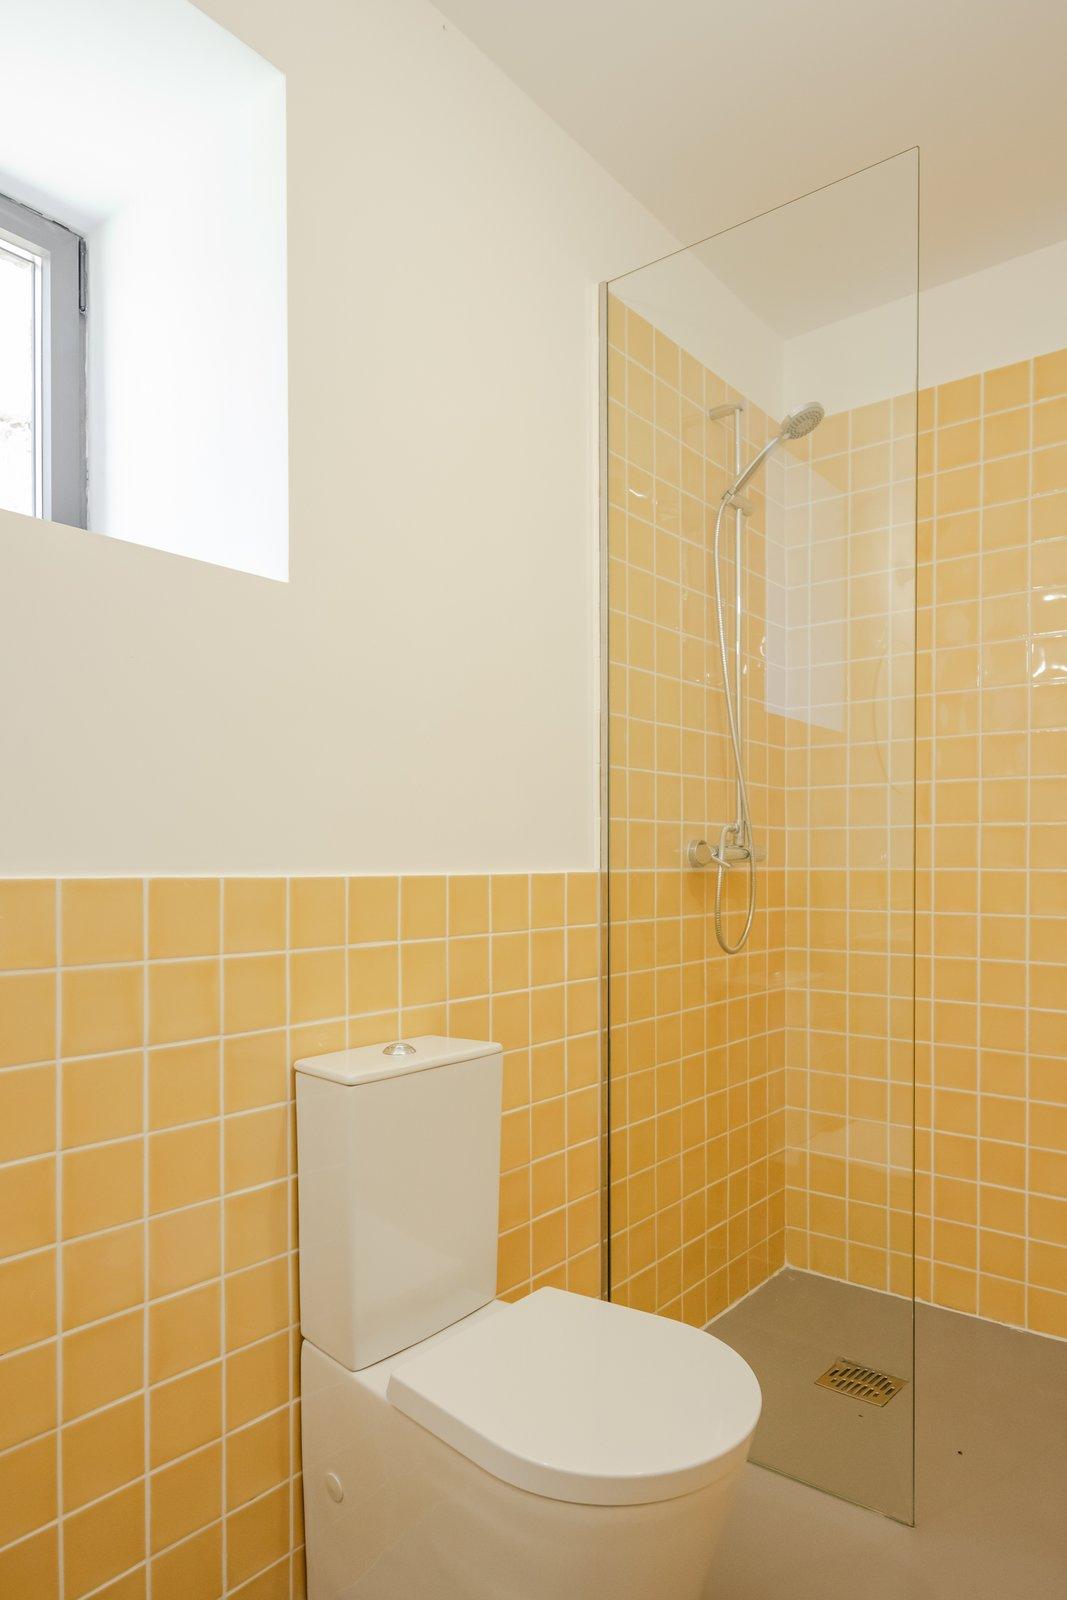 MCR2 House by Filipe Pina Arquitectura Bathroom